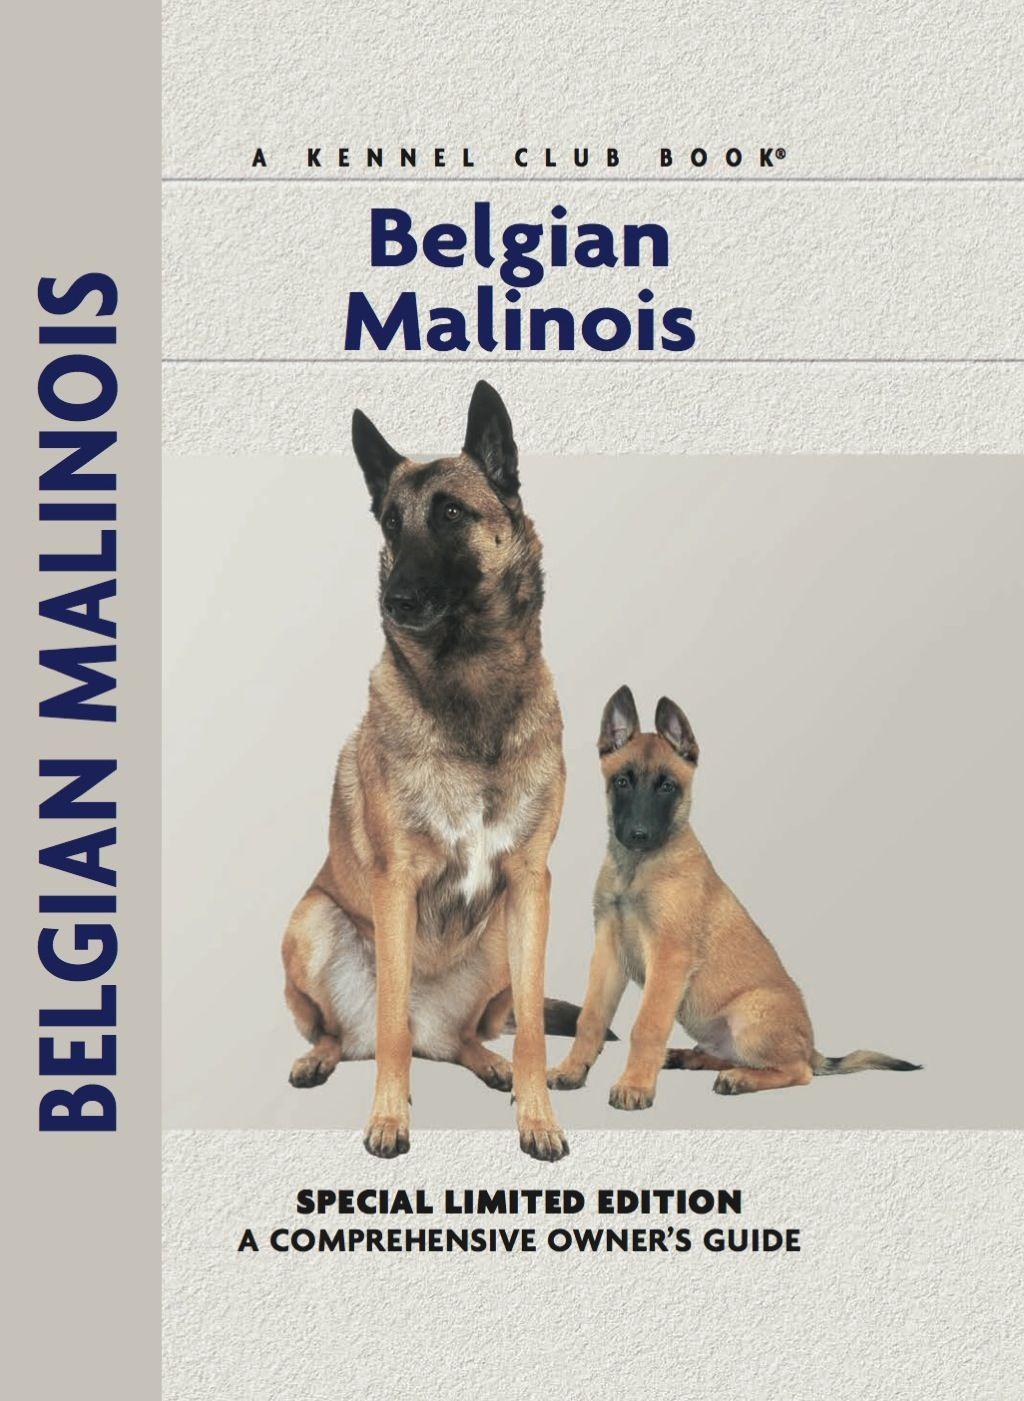 Belgian Malinois Ebook Best Pet Insurance Belgian Malinois Pet Insurance Reviews Belgium Malinois